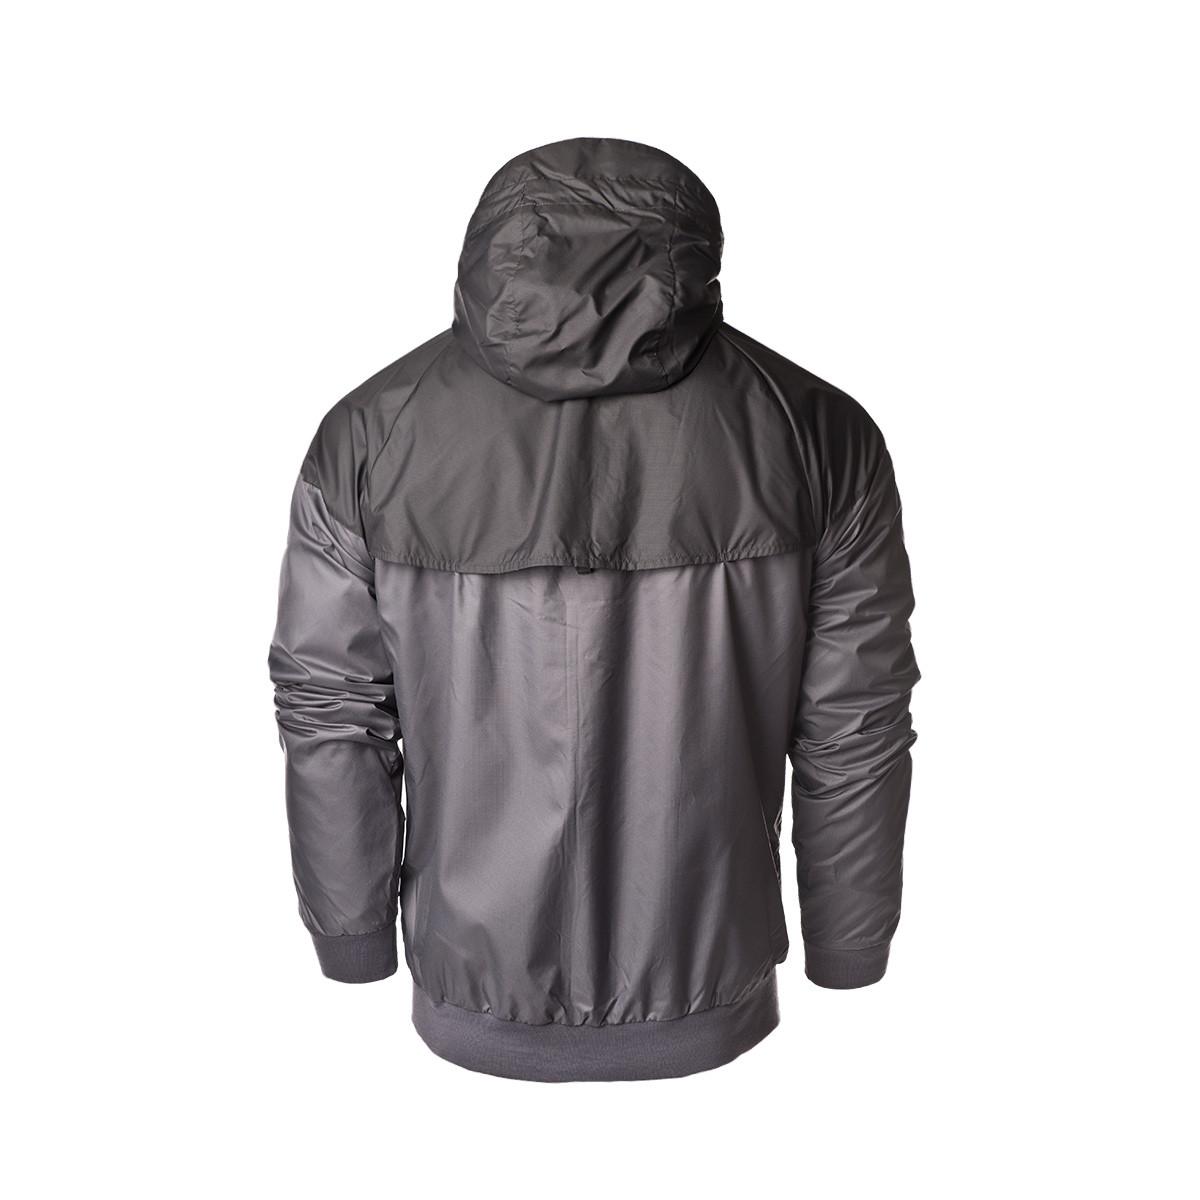 a menudo impacto oleada  ideja muški stipendija abrigo barcelona nike - herbandedi.org